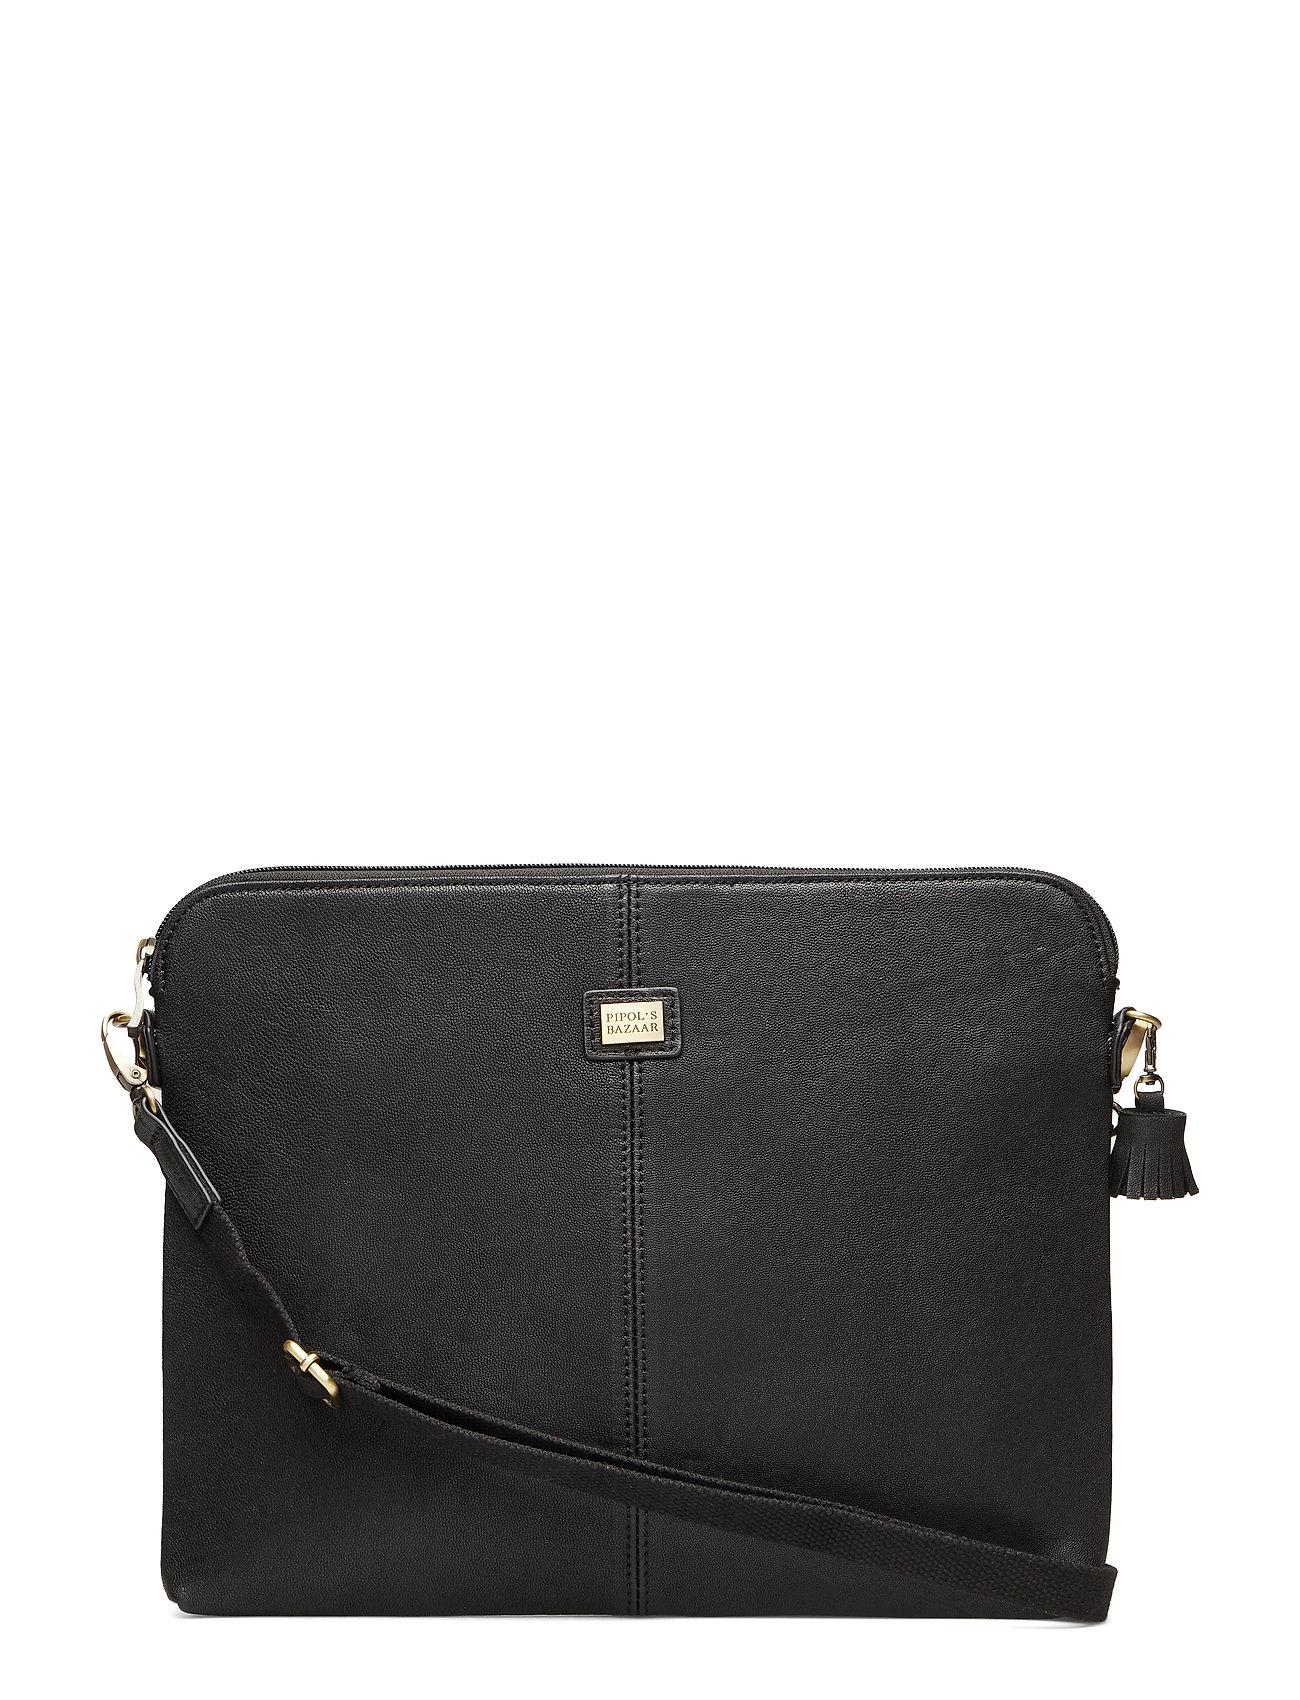 "PIPOL'S BAZAAR Leather Pipol´s Laptop Cover 13"" - BLACK"